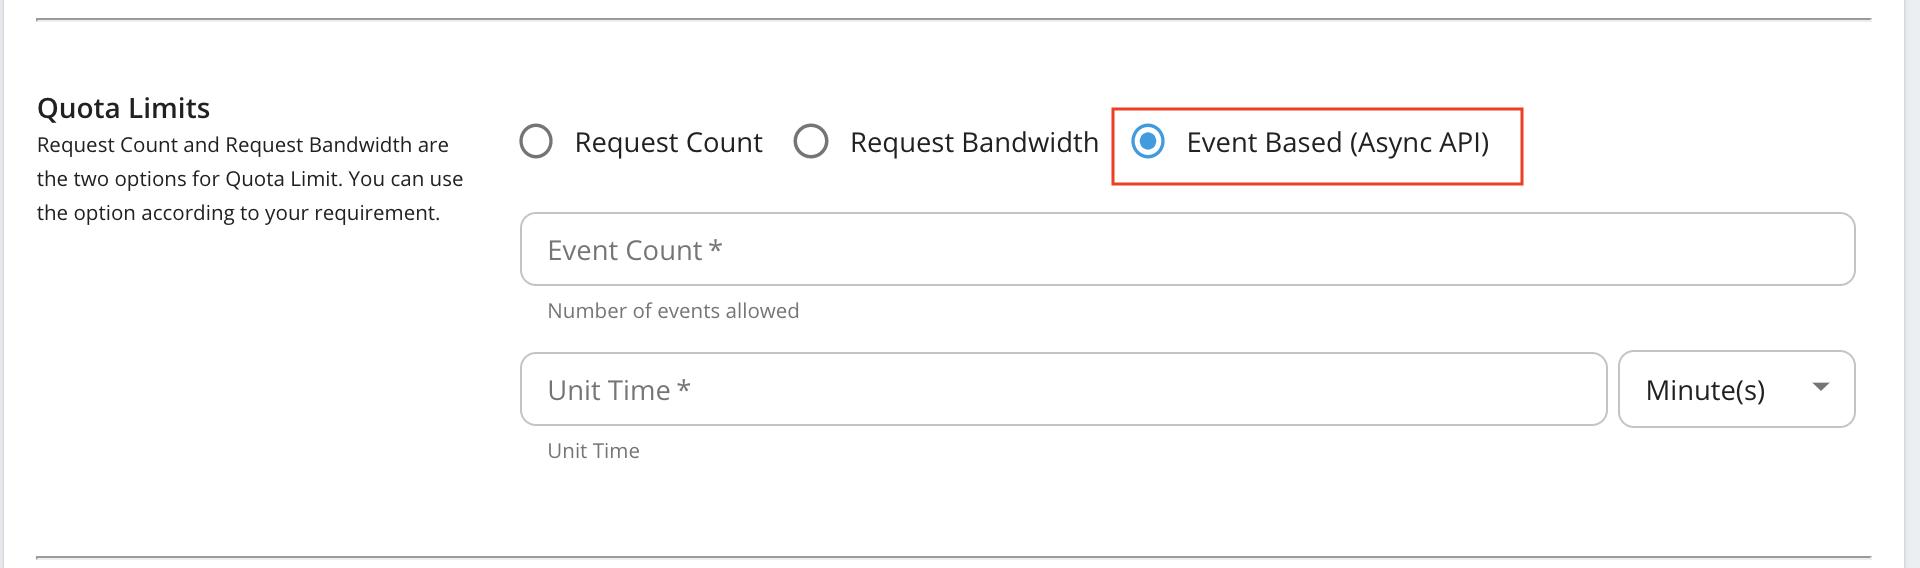 Event Based (AsyncAPI) quota limits